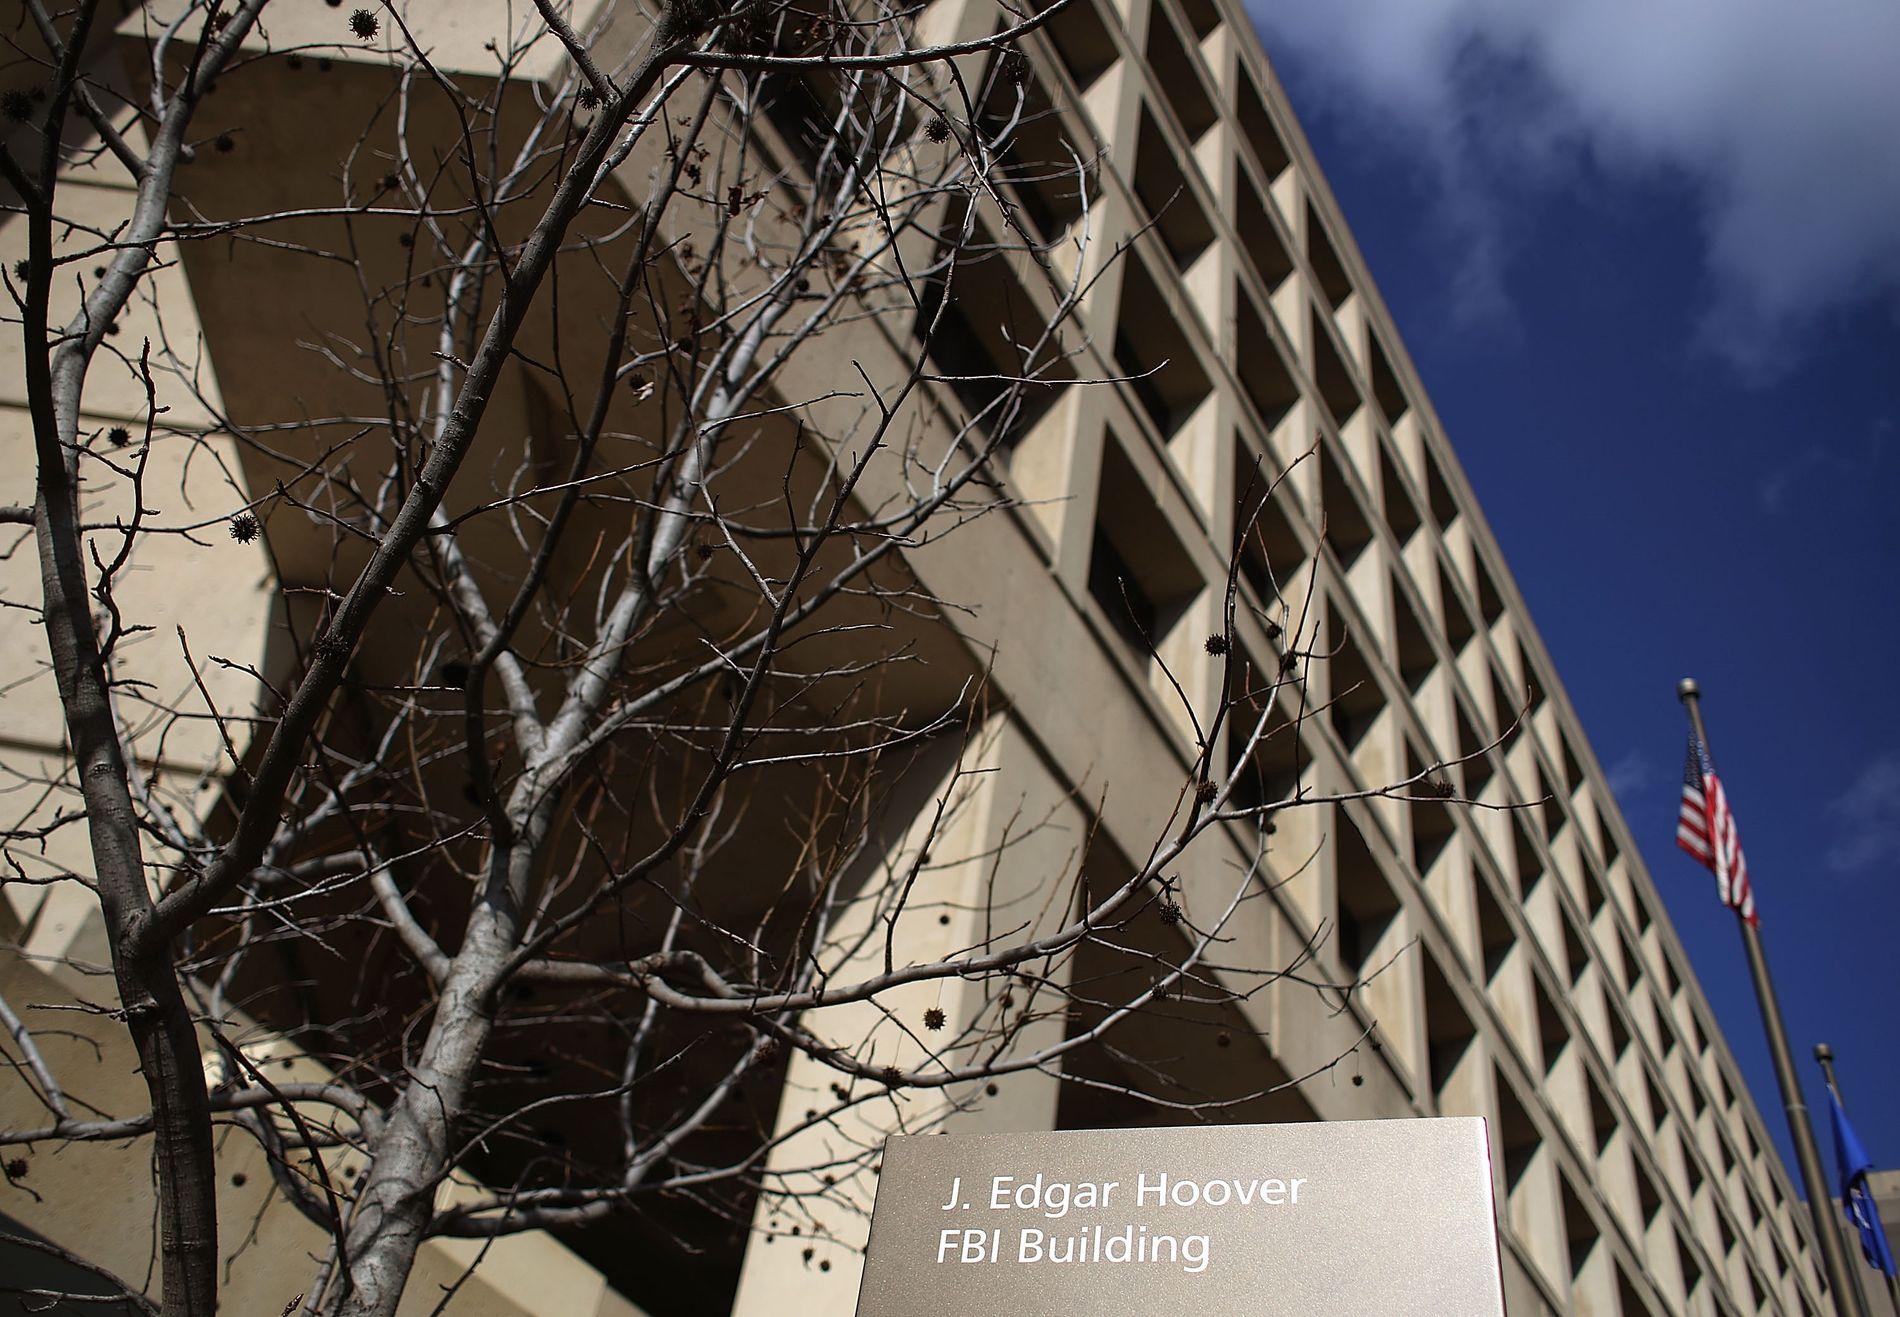 FBI: Federal Bureau of Investegation er en føderal etat for etterforskning av kriminalitet underlagt det amerikanske justisdepartementet. FBIs hovedkvarter ligger i Washington, D.C.